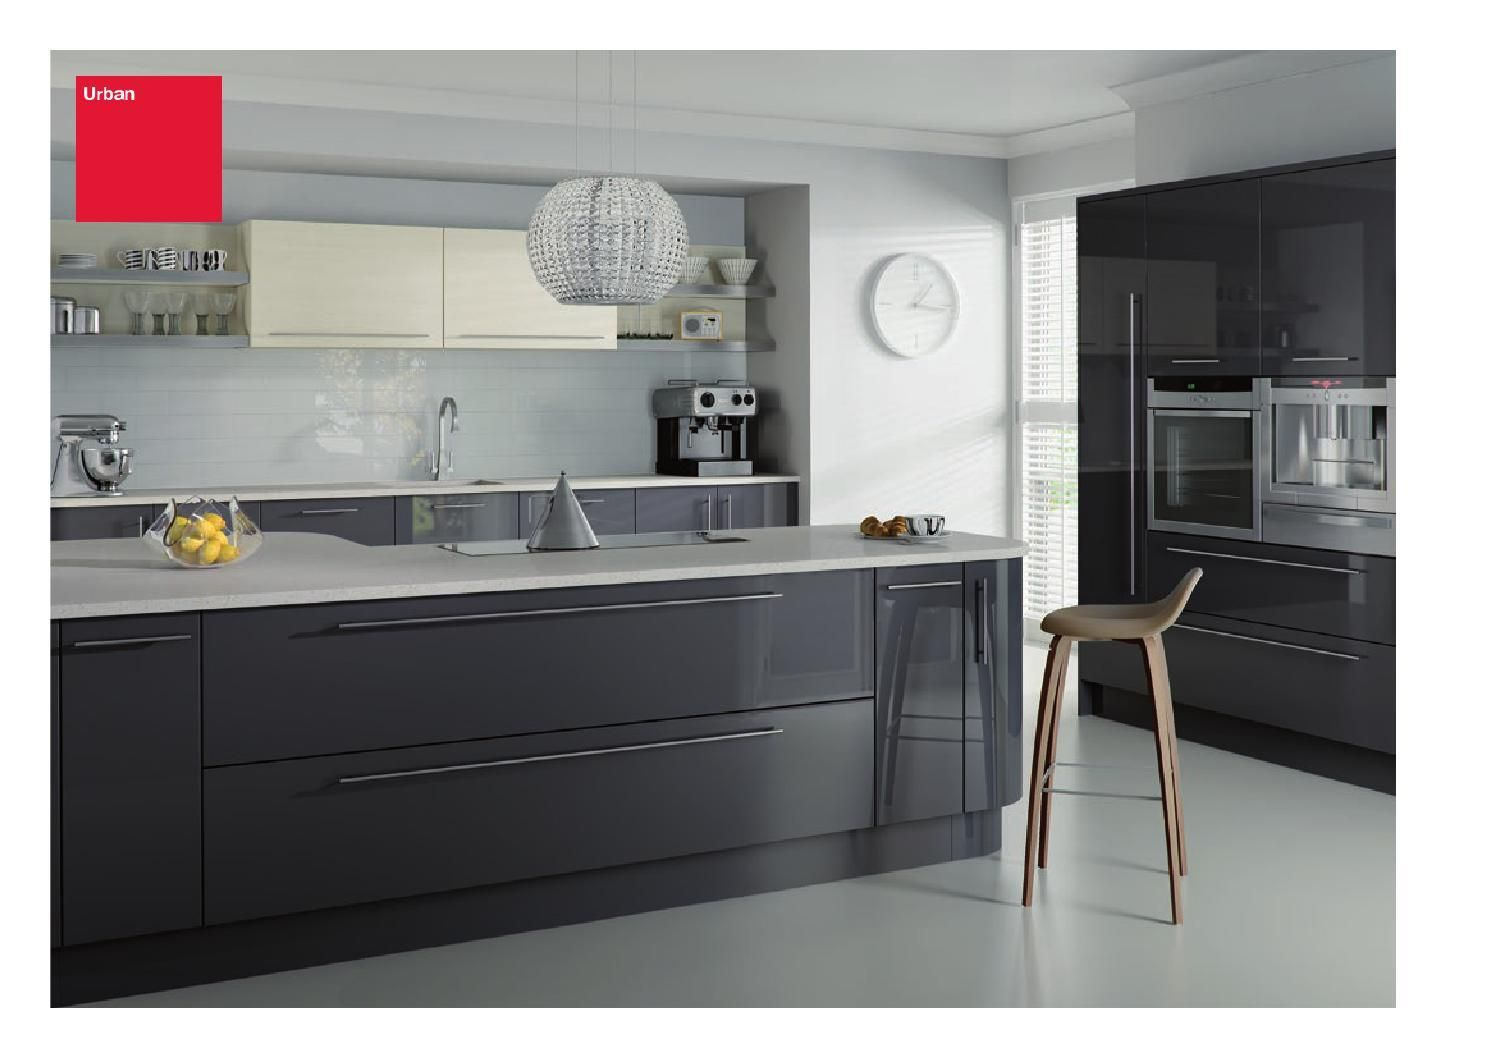 Sigma 9 Kitchens brochure   Grey gloss kitchen, Modern kitchen ...